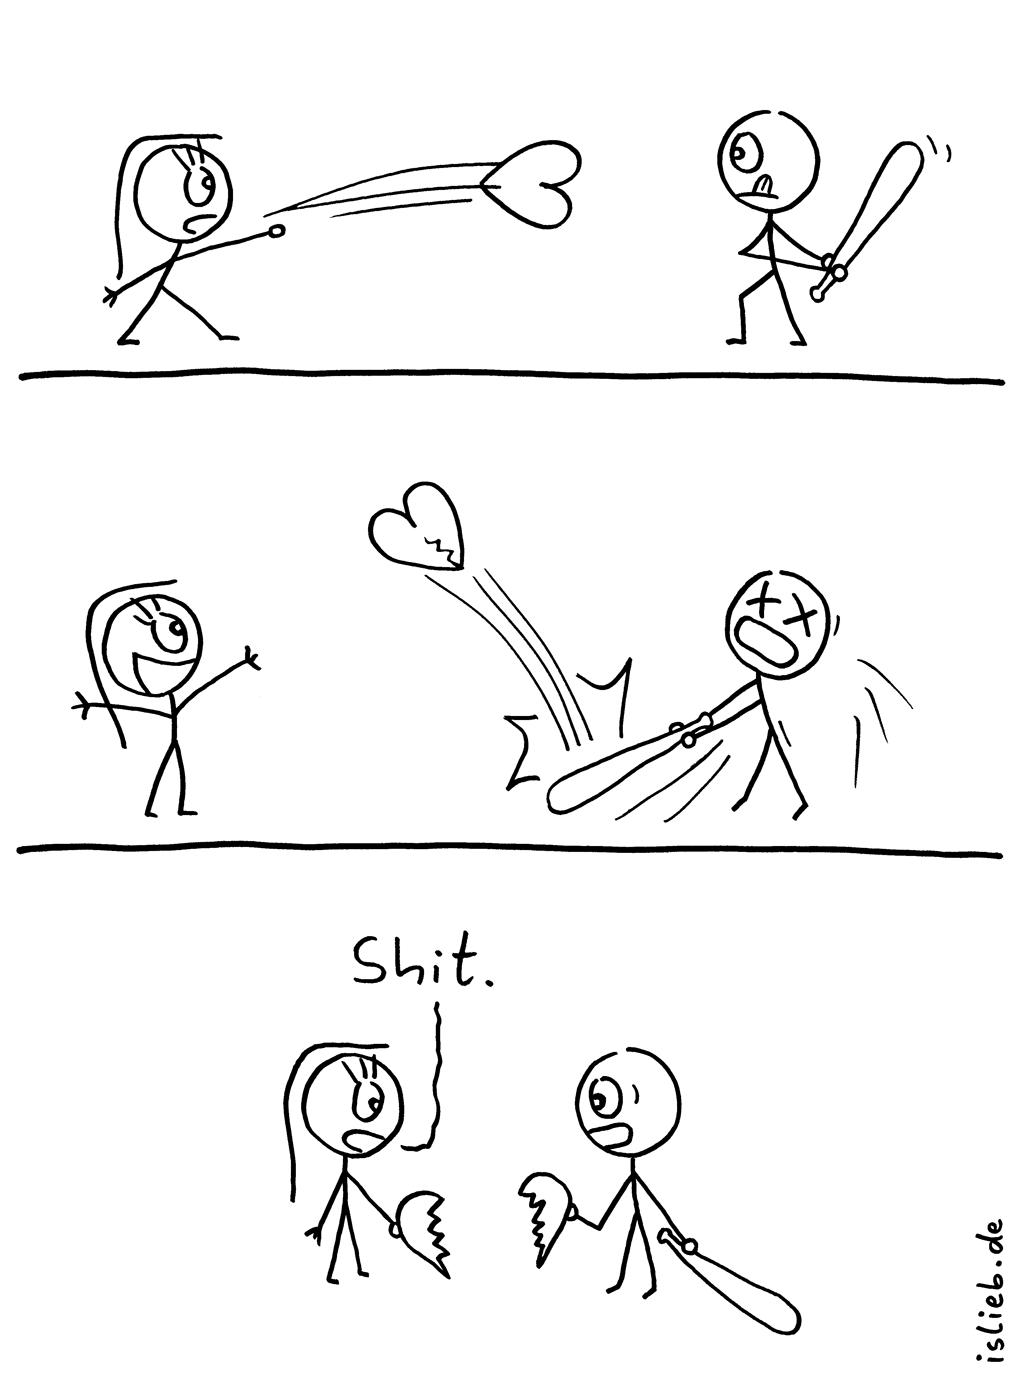 Shit | Baseball-Comic | is lieb? | shit, shyte, scheiße, verkackt, verschissen, Sport, gebrochenes Herz, Herzensbruch, Beziehung